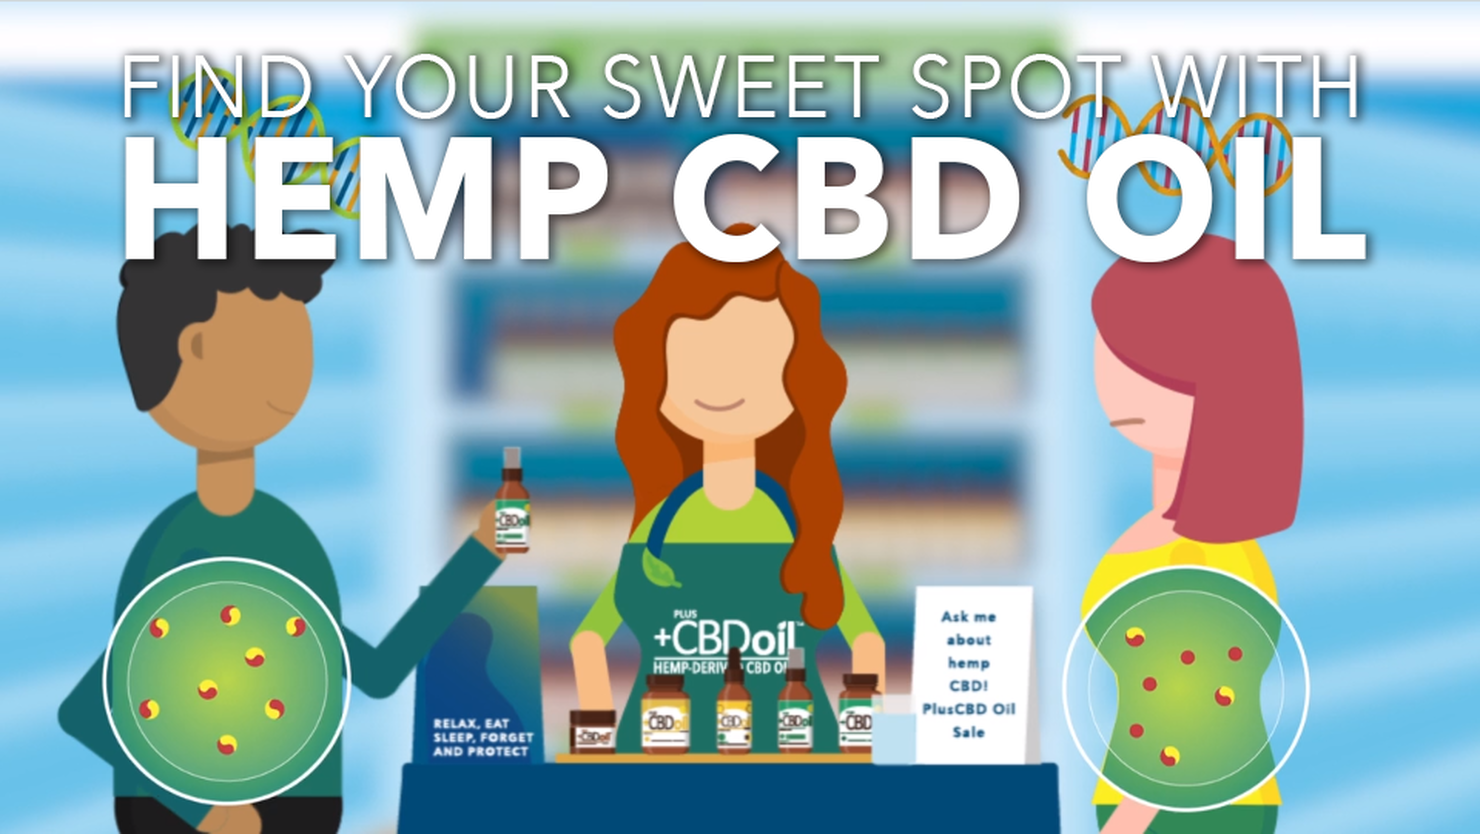 Find Your Sweet Spot with Hemp CBD Oil